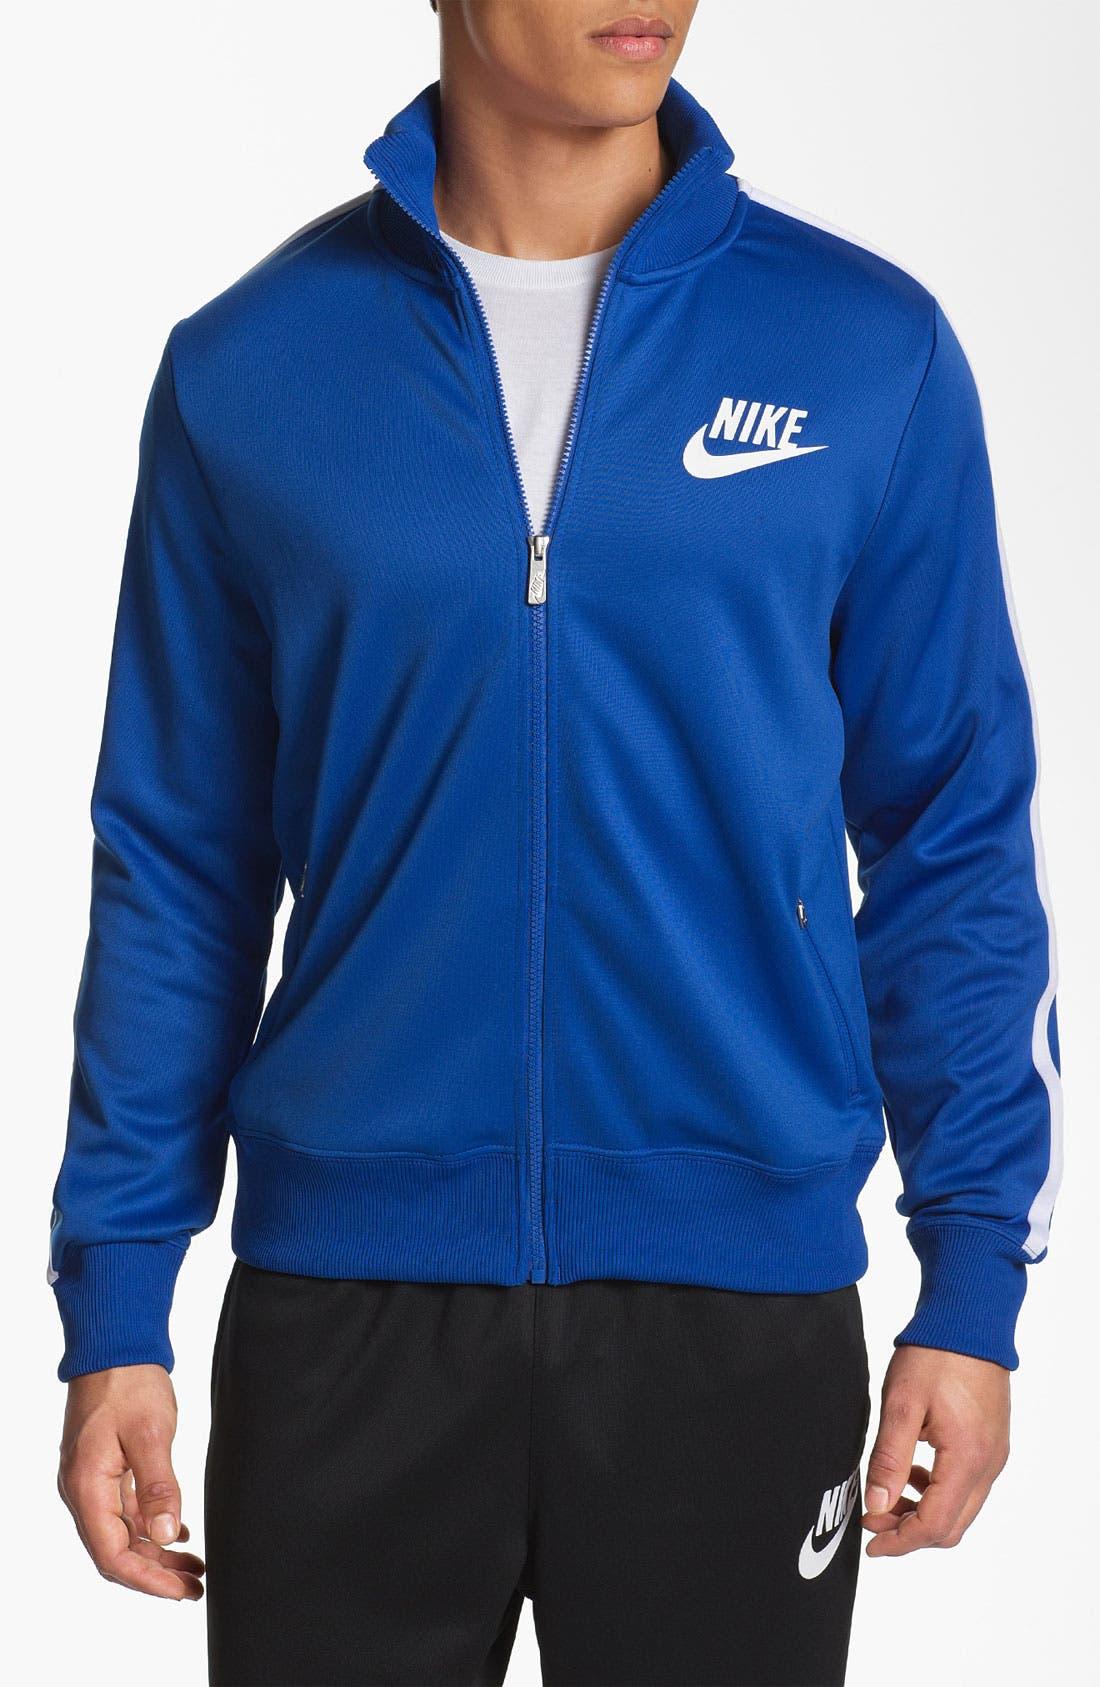 Alternate Image 1 Selected - Nike 'HBR' Track Jacket